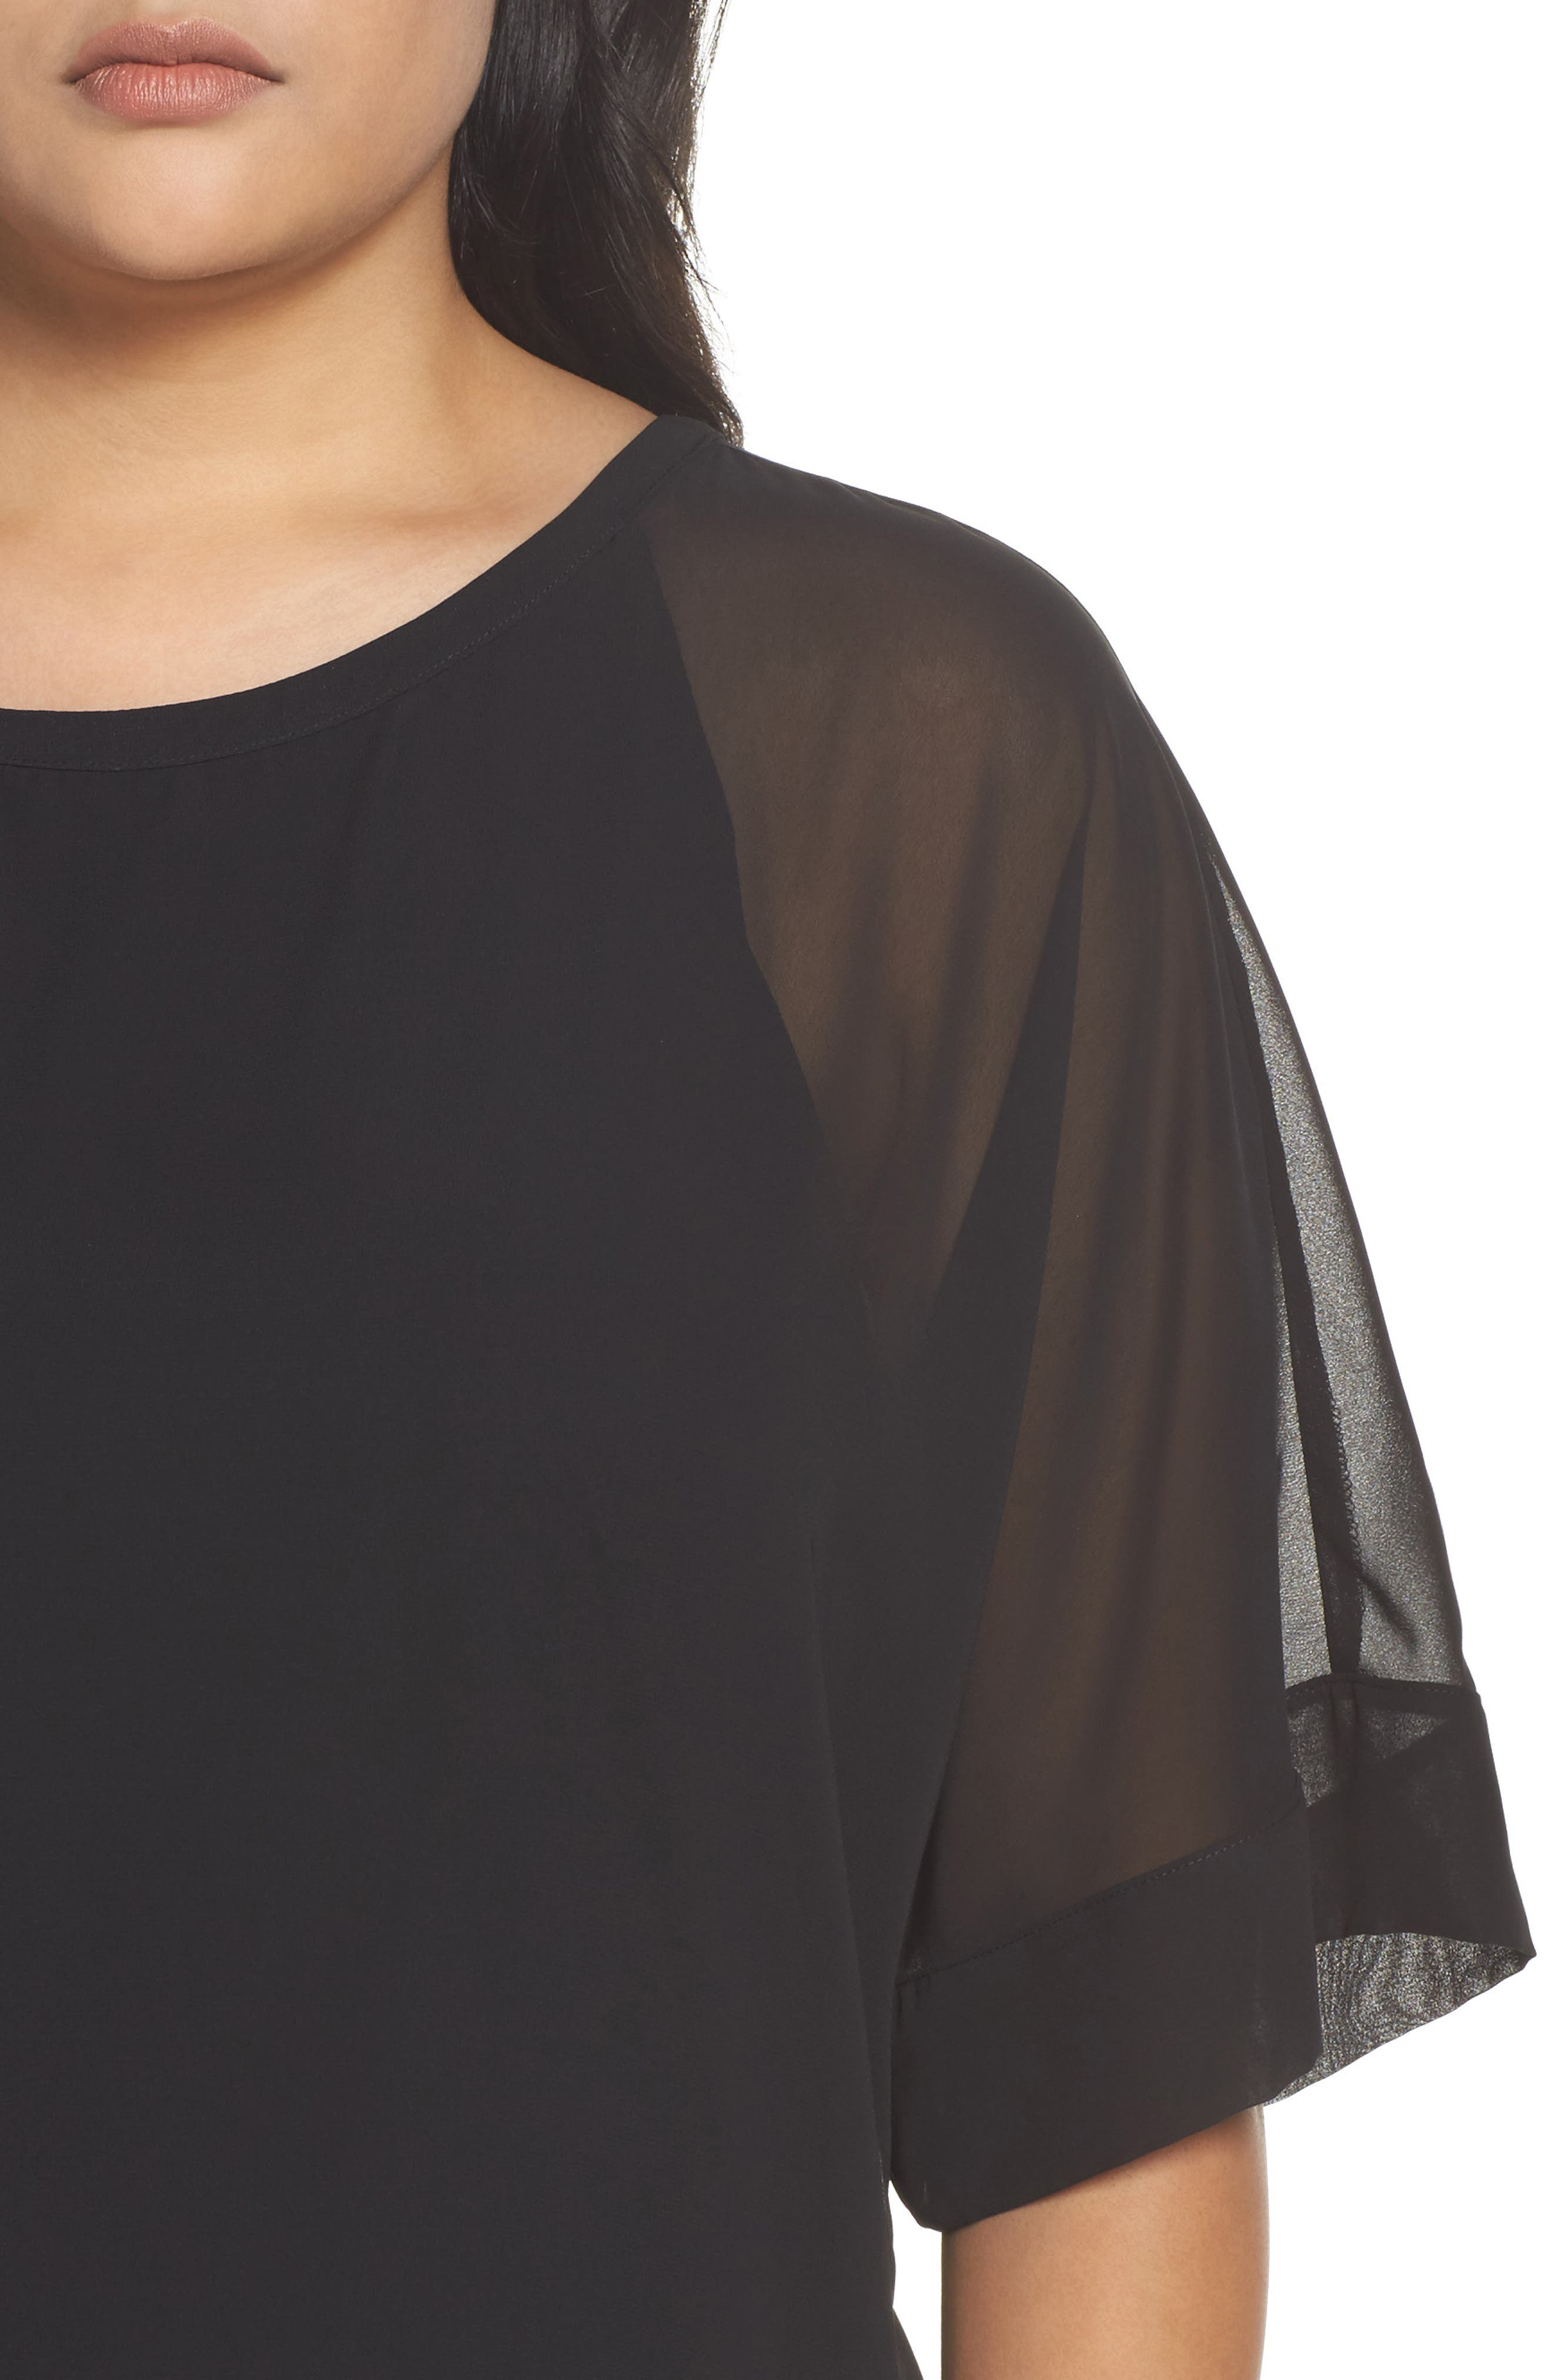 Kimono Layered Top,                             Alternate thumbnail 4, color,                             001